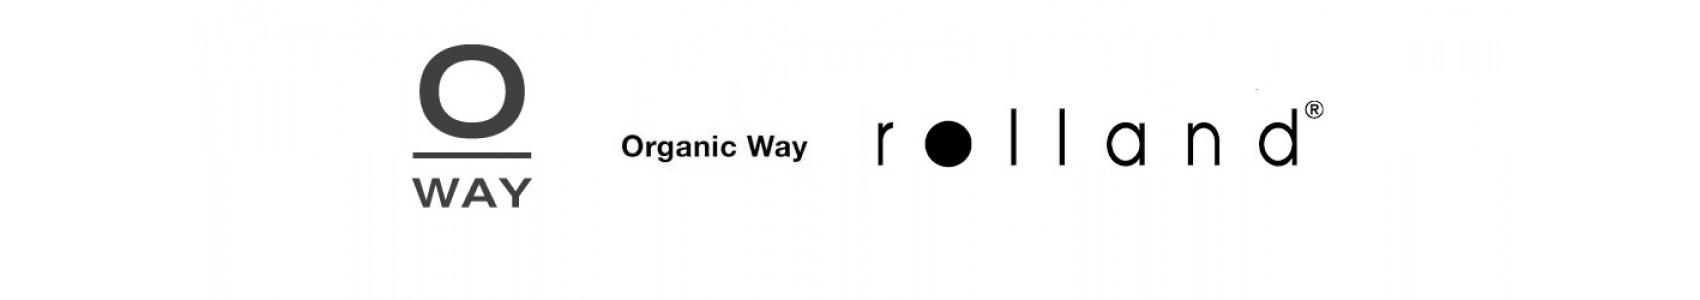 Organic Way Rolland